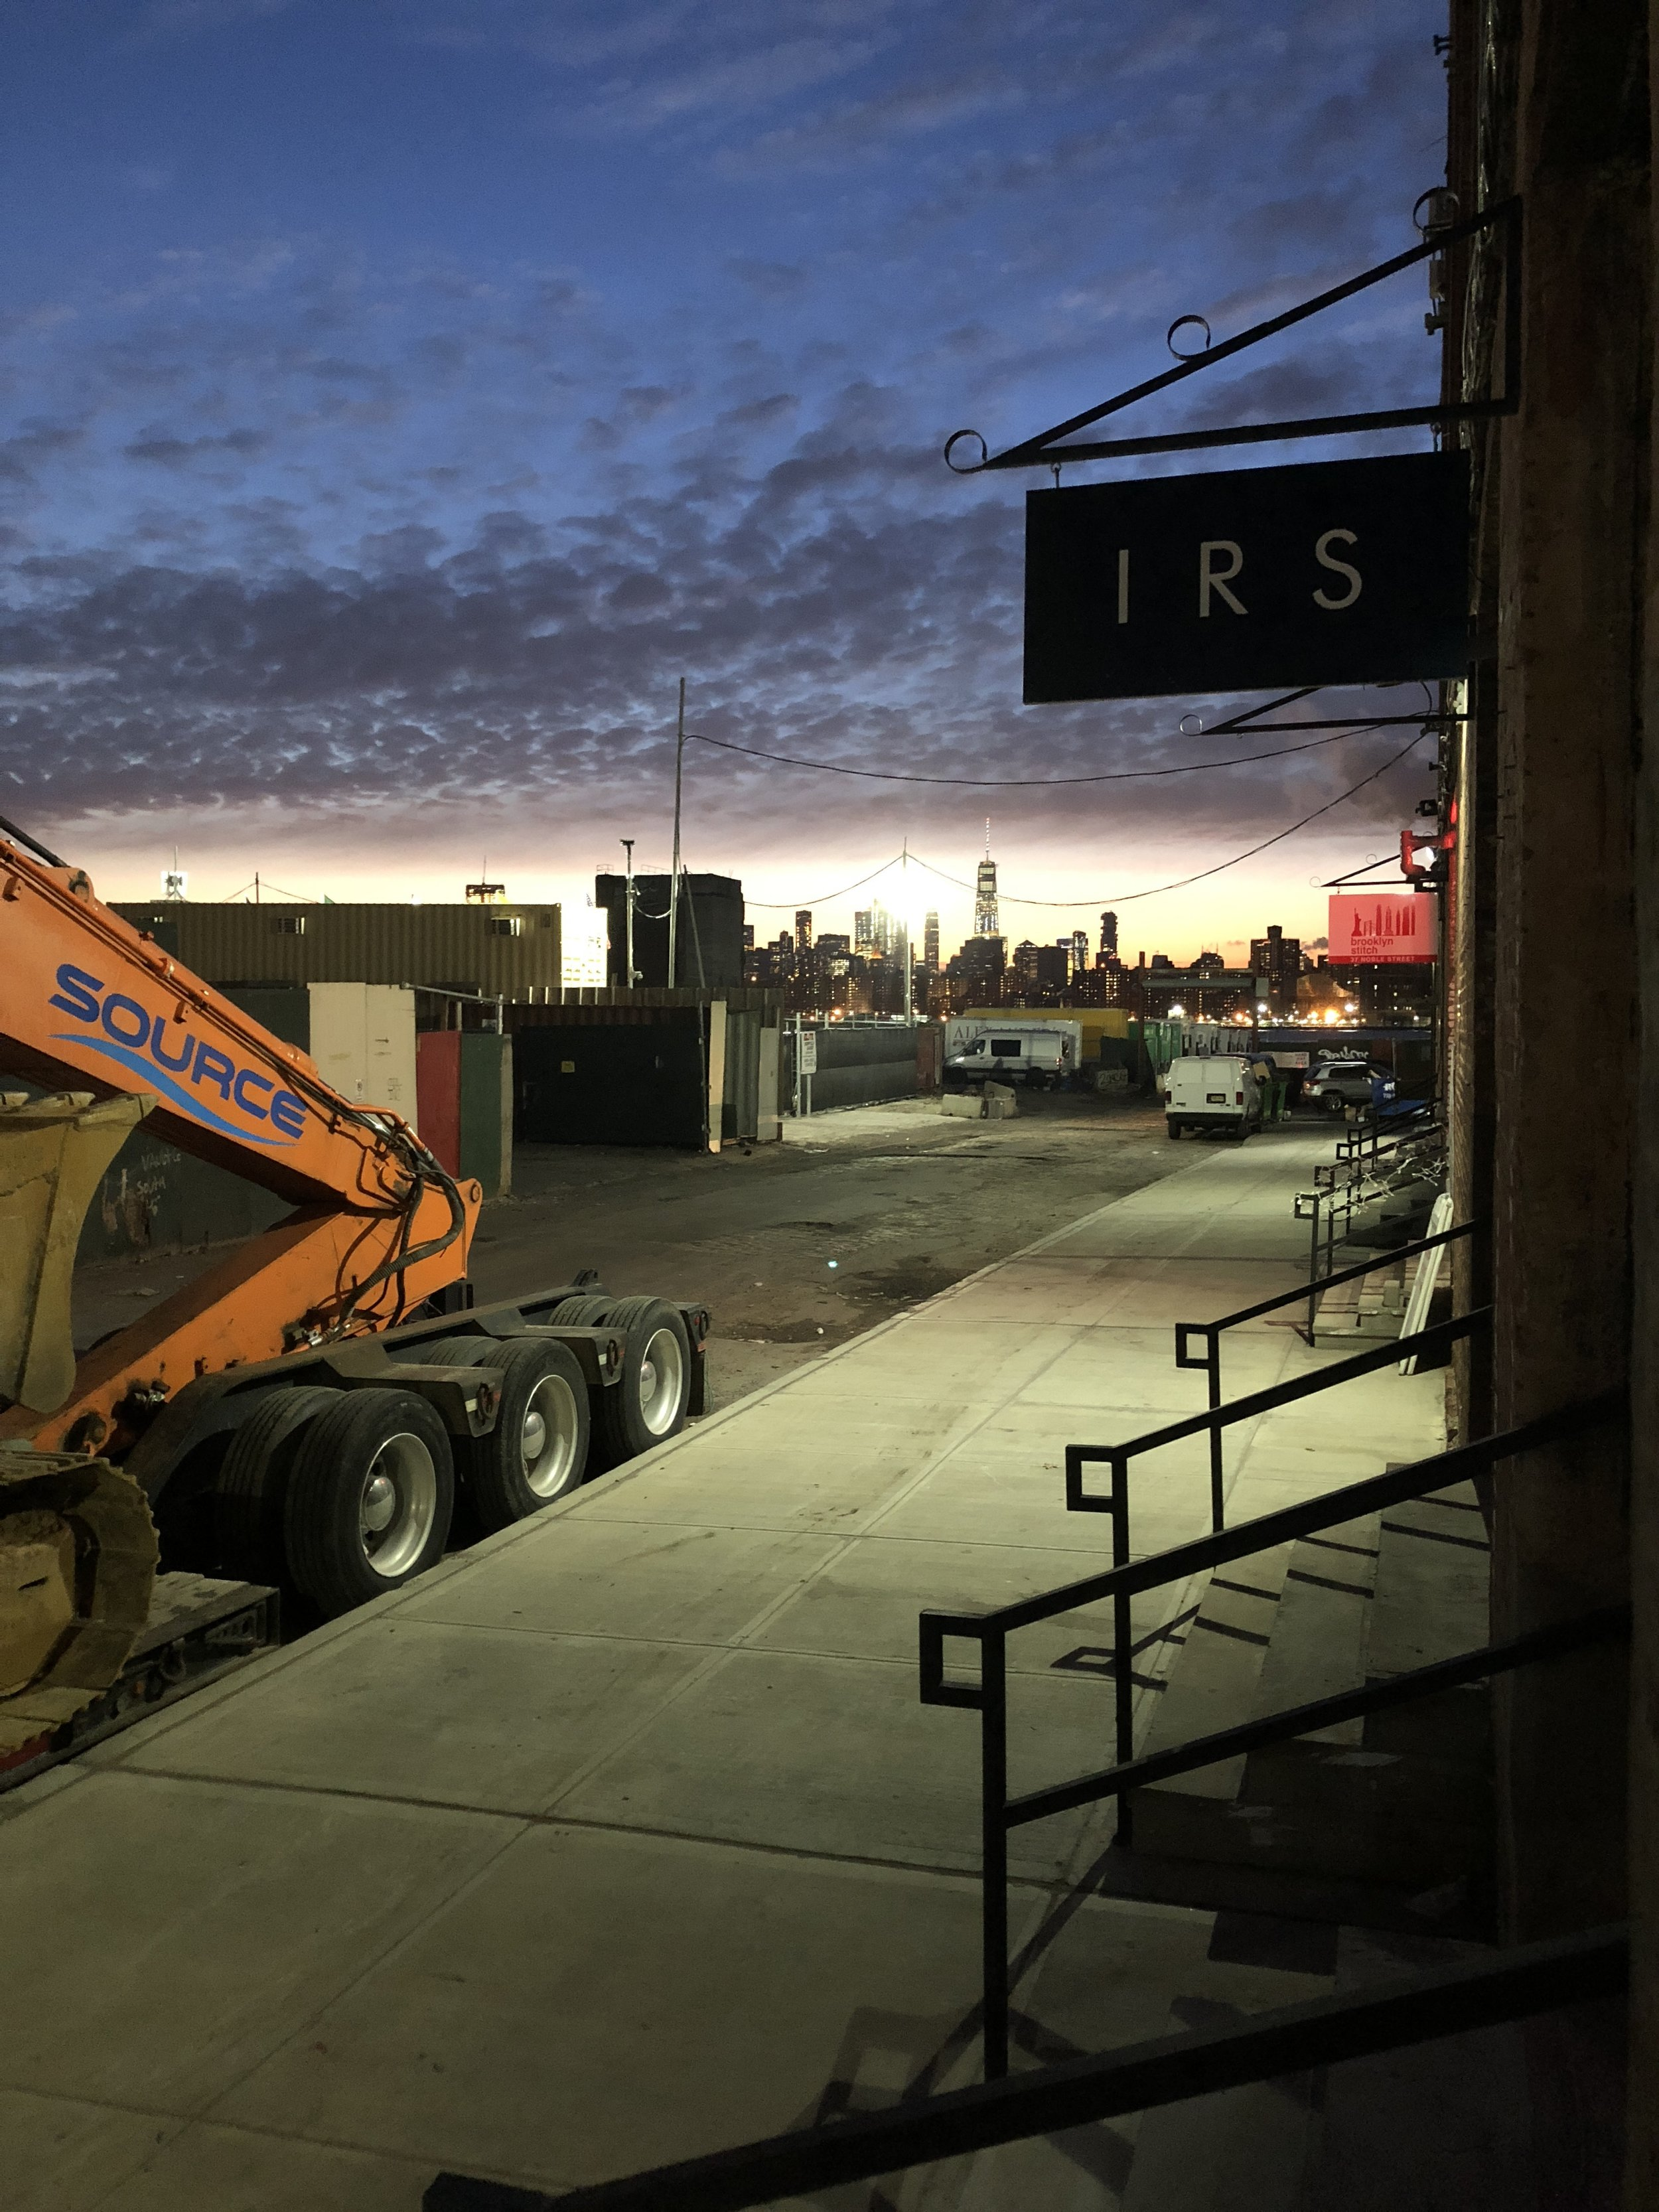 Isaac-Rae Studio in Greenpoint, Brooklyn